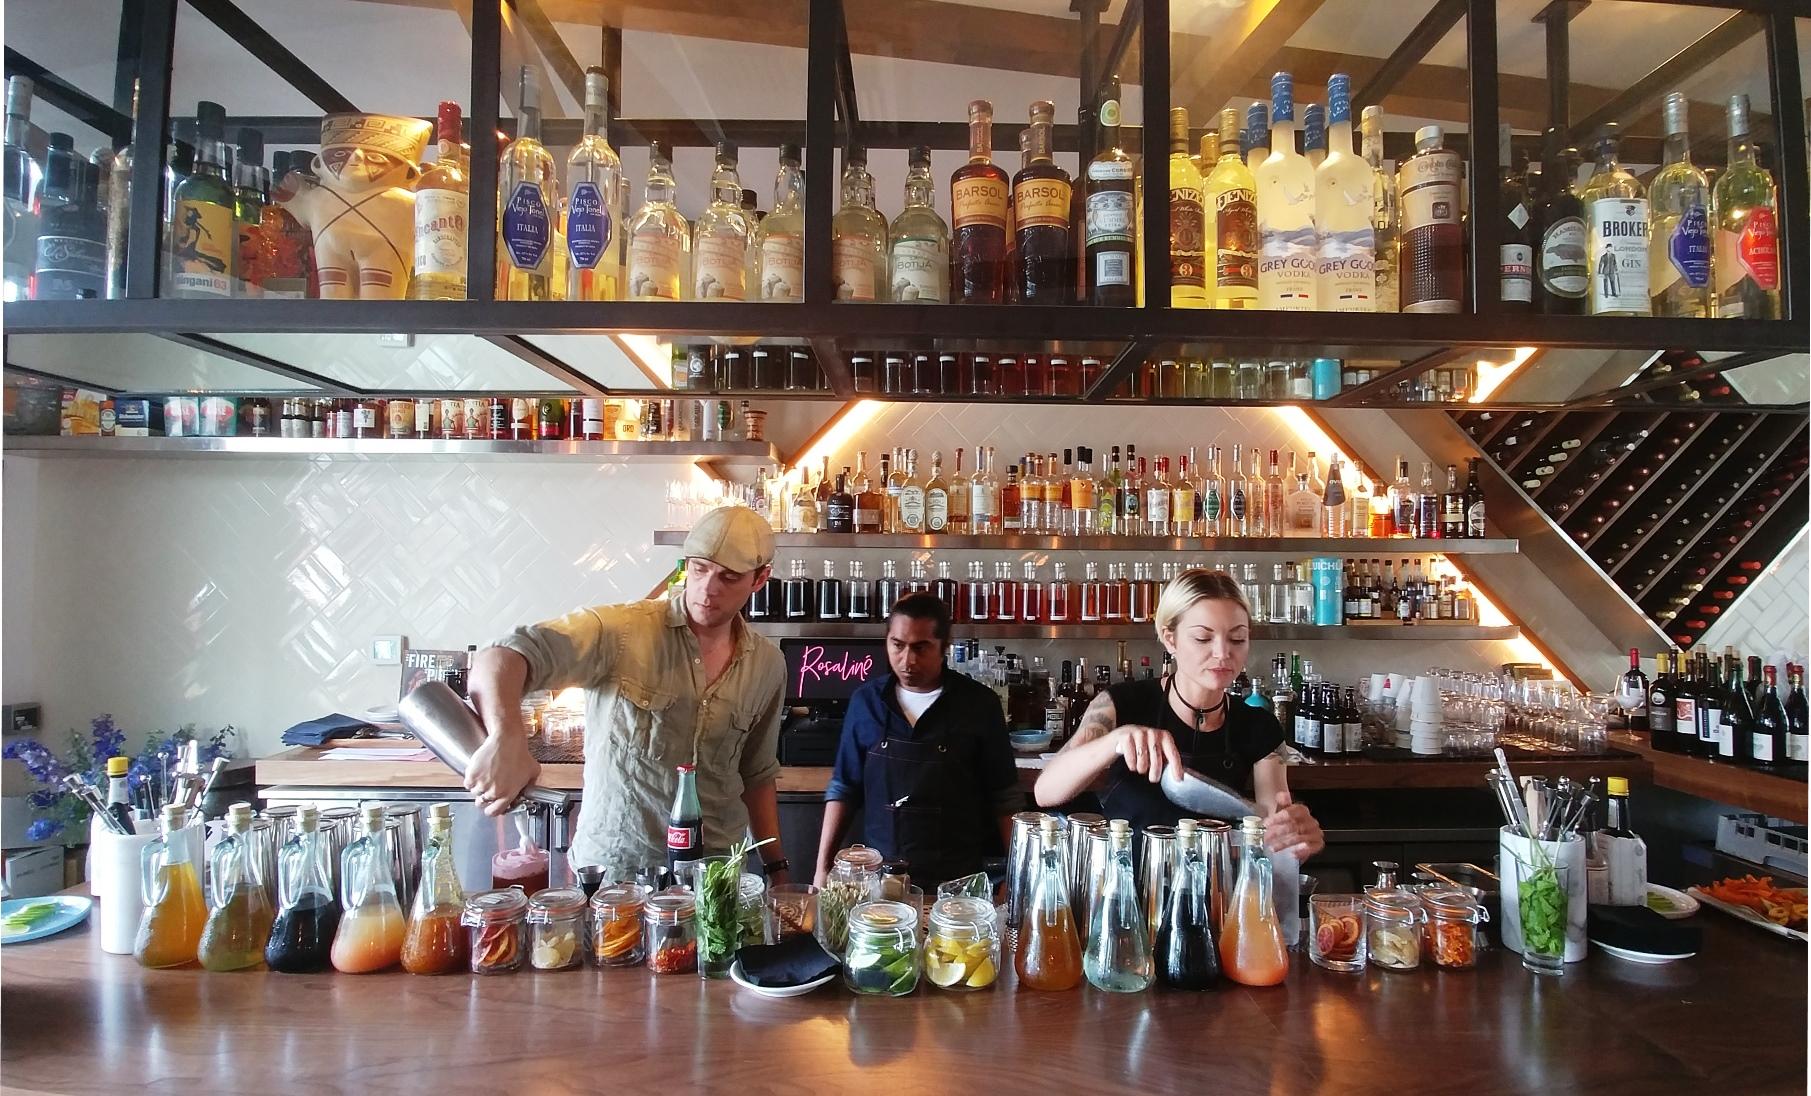 Rosaliné bartenders by Caroline Pardilla